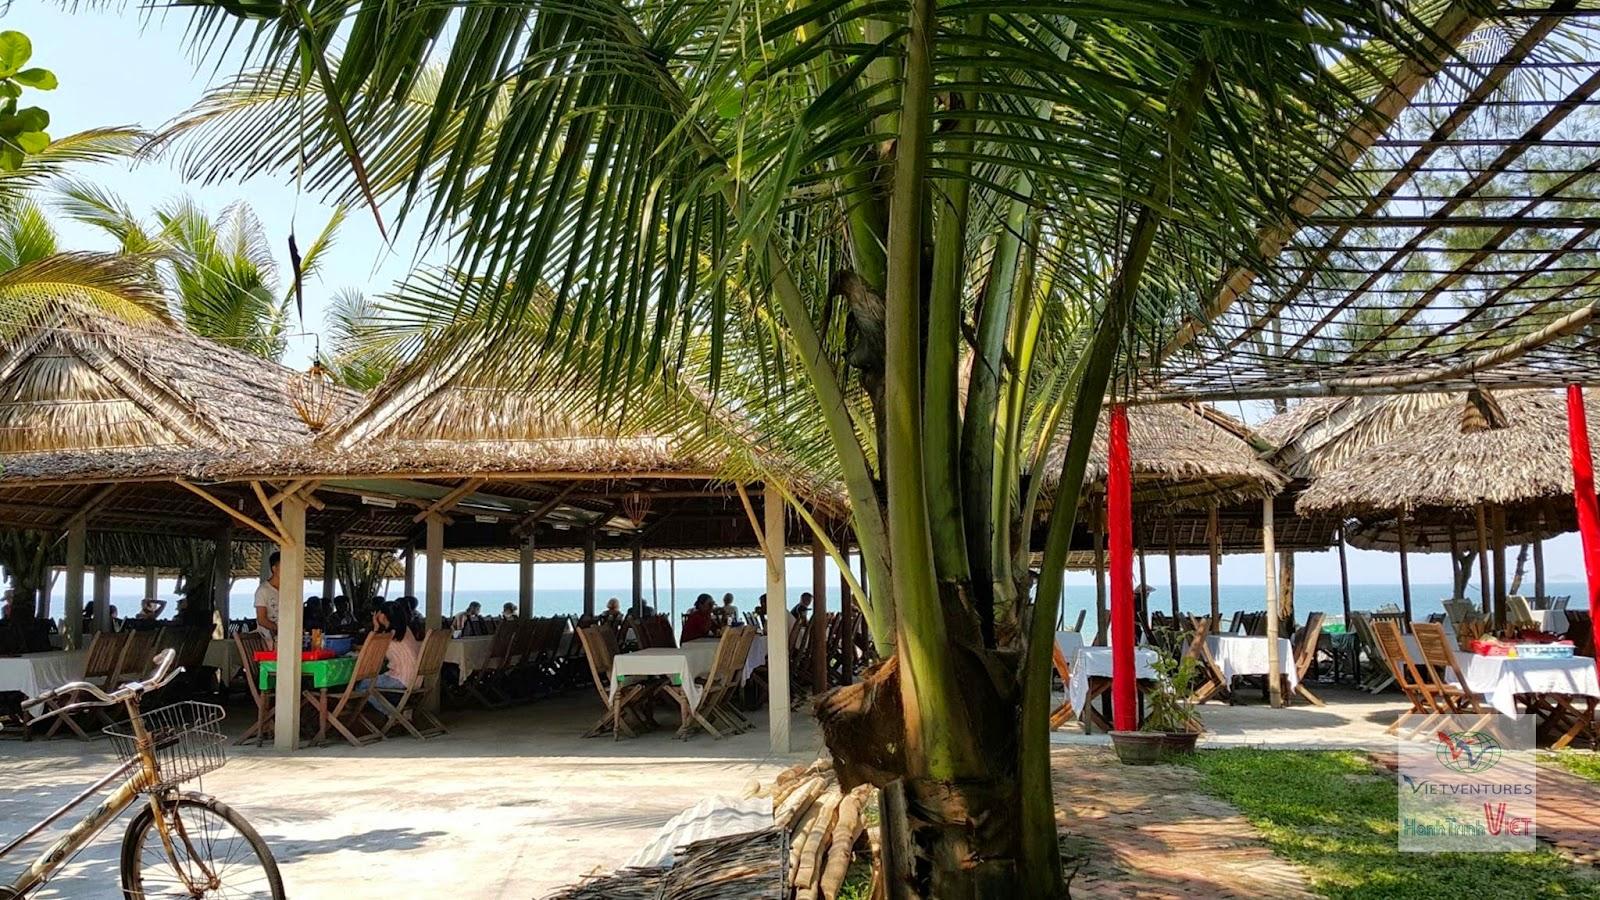 Bãi biển An Bàng, Hội An